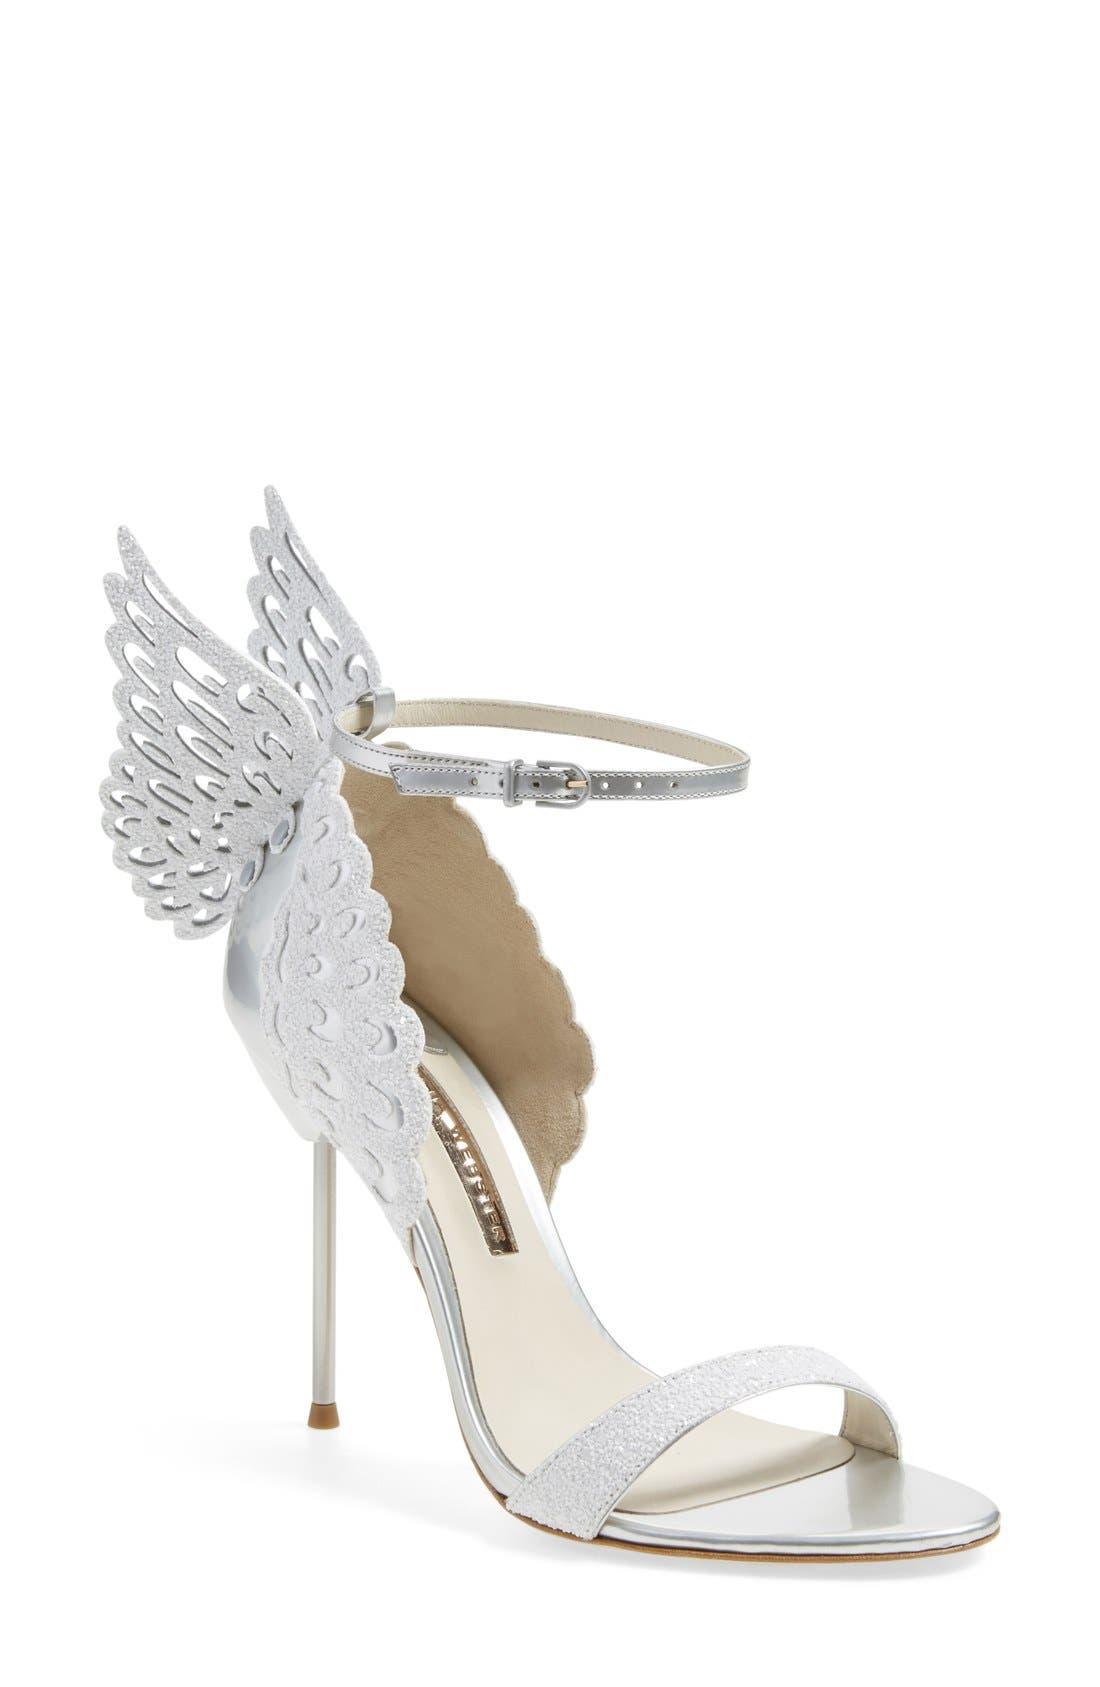 Main Image - Sophia Webster 'Evangeline' Ankle Strap Sandal (Women)